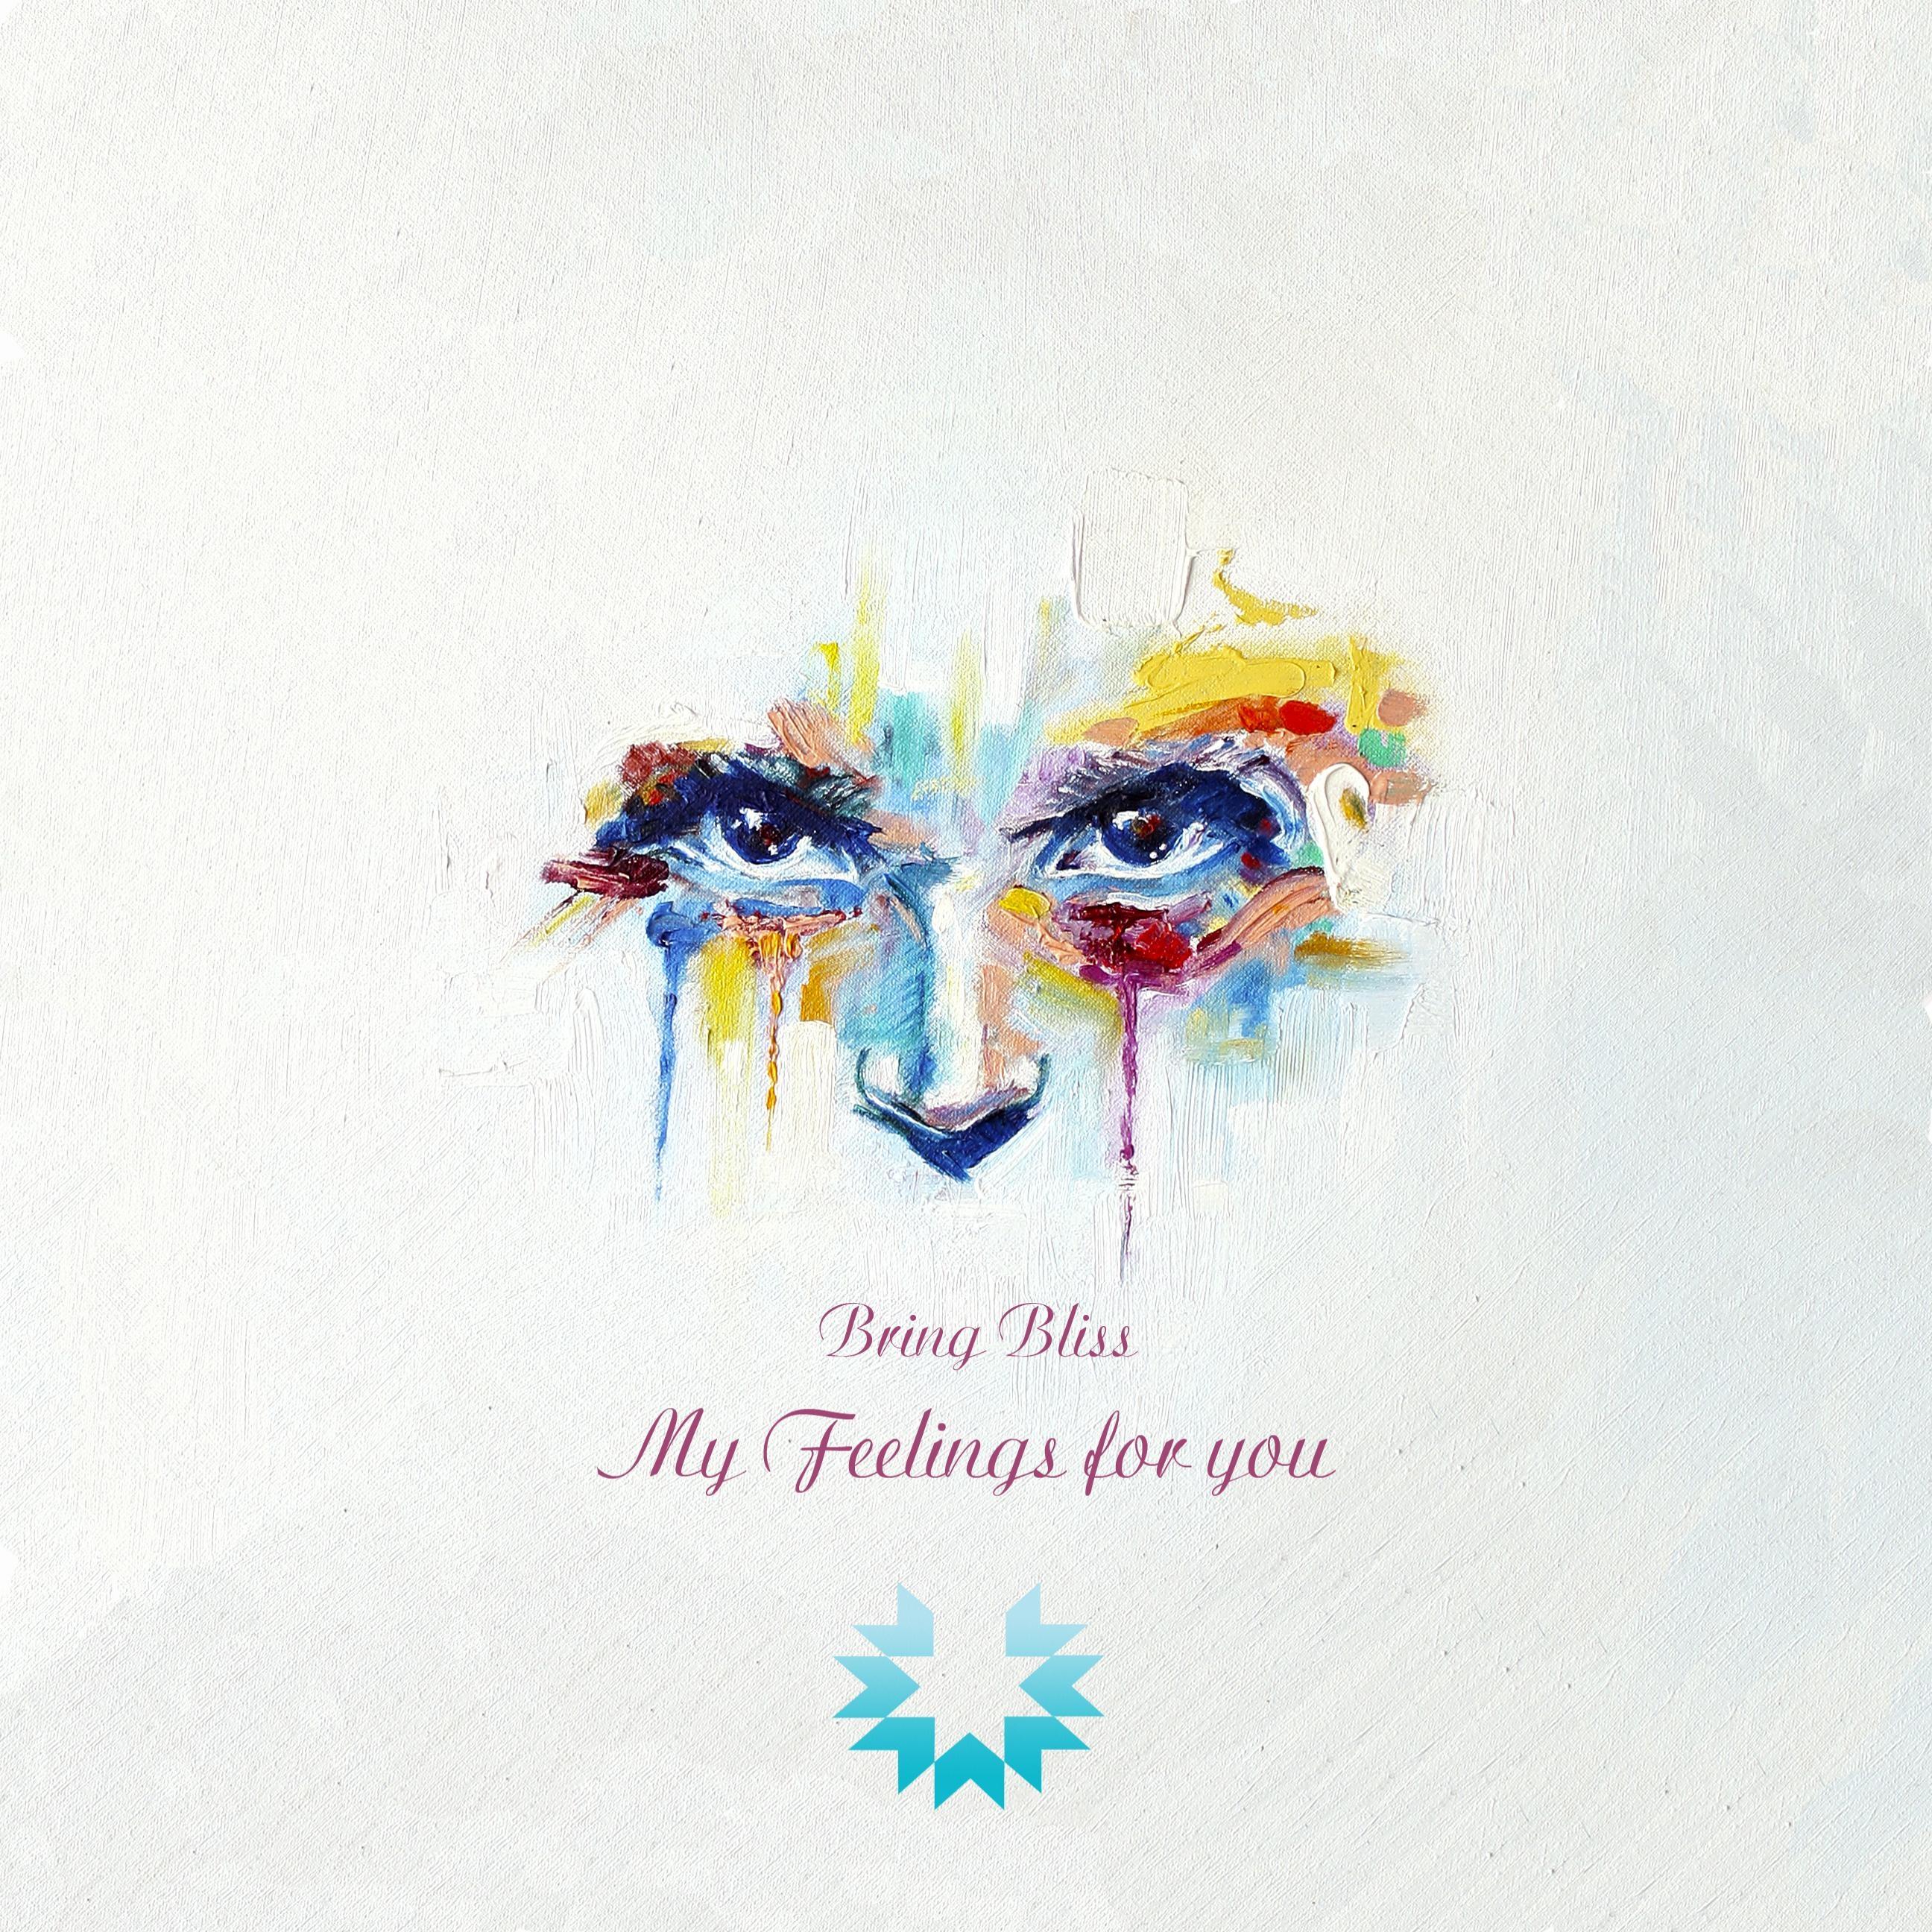 Bring Bliss - Cold Heart (Original Mix)